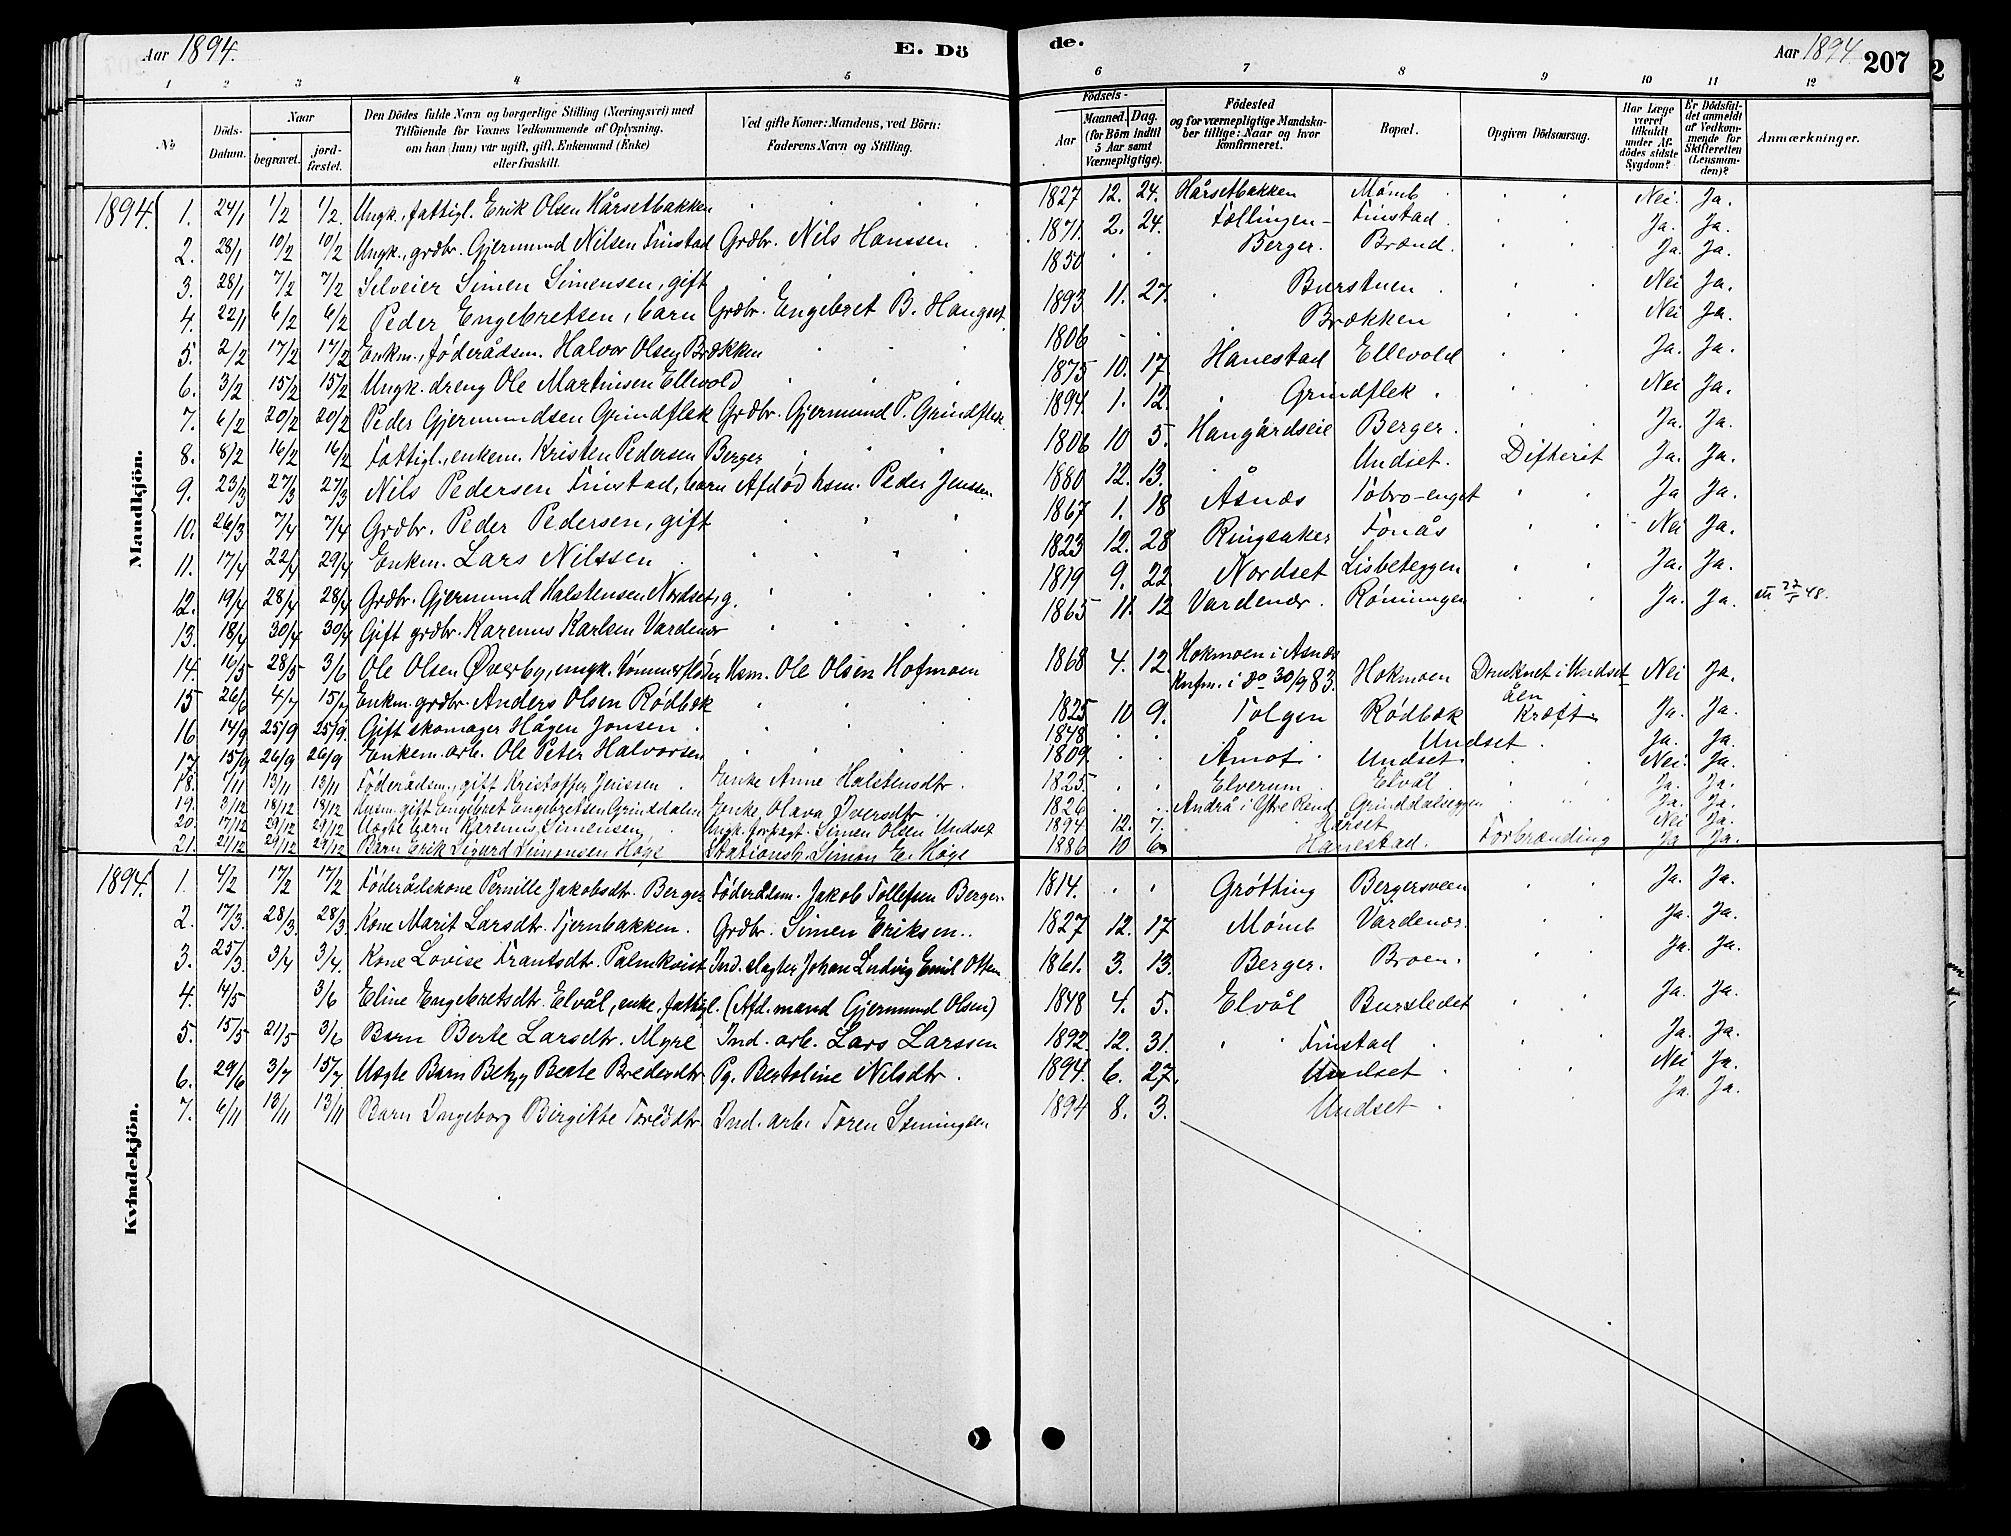 SAH, Rendalen prestekontor, H/Ha/Hab/L0003: Parish register (copy) no. 3, 1879-1904, p. 207